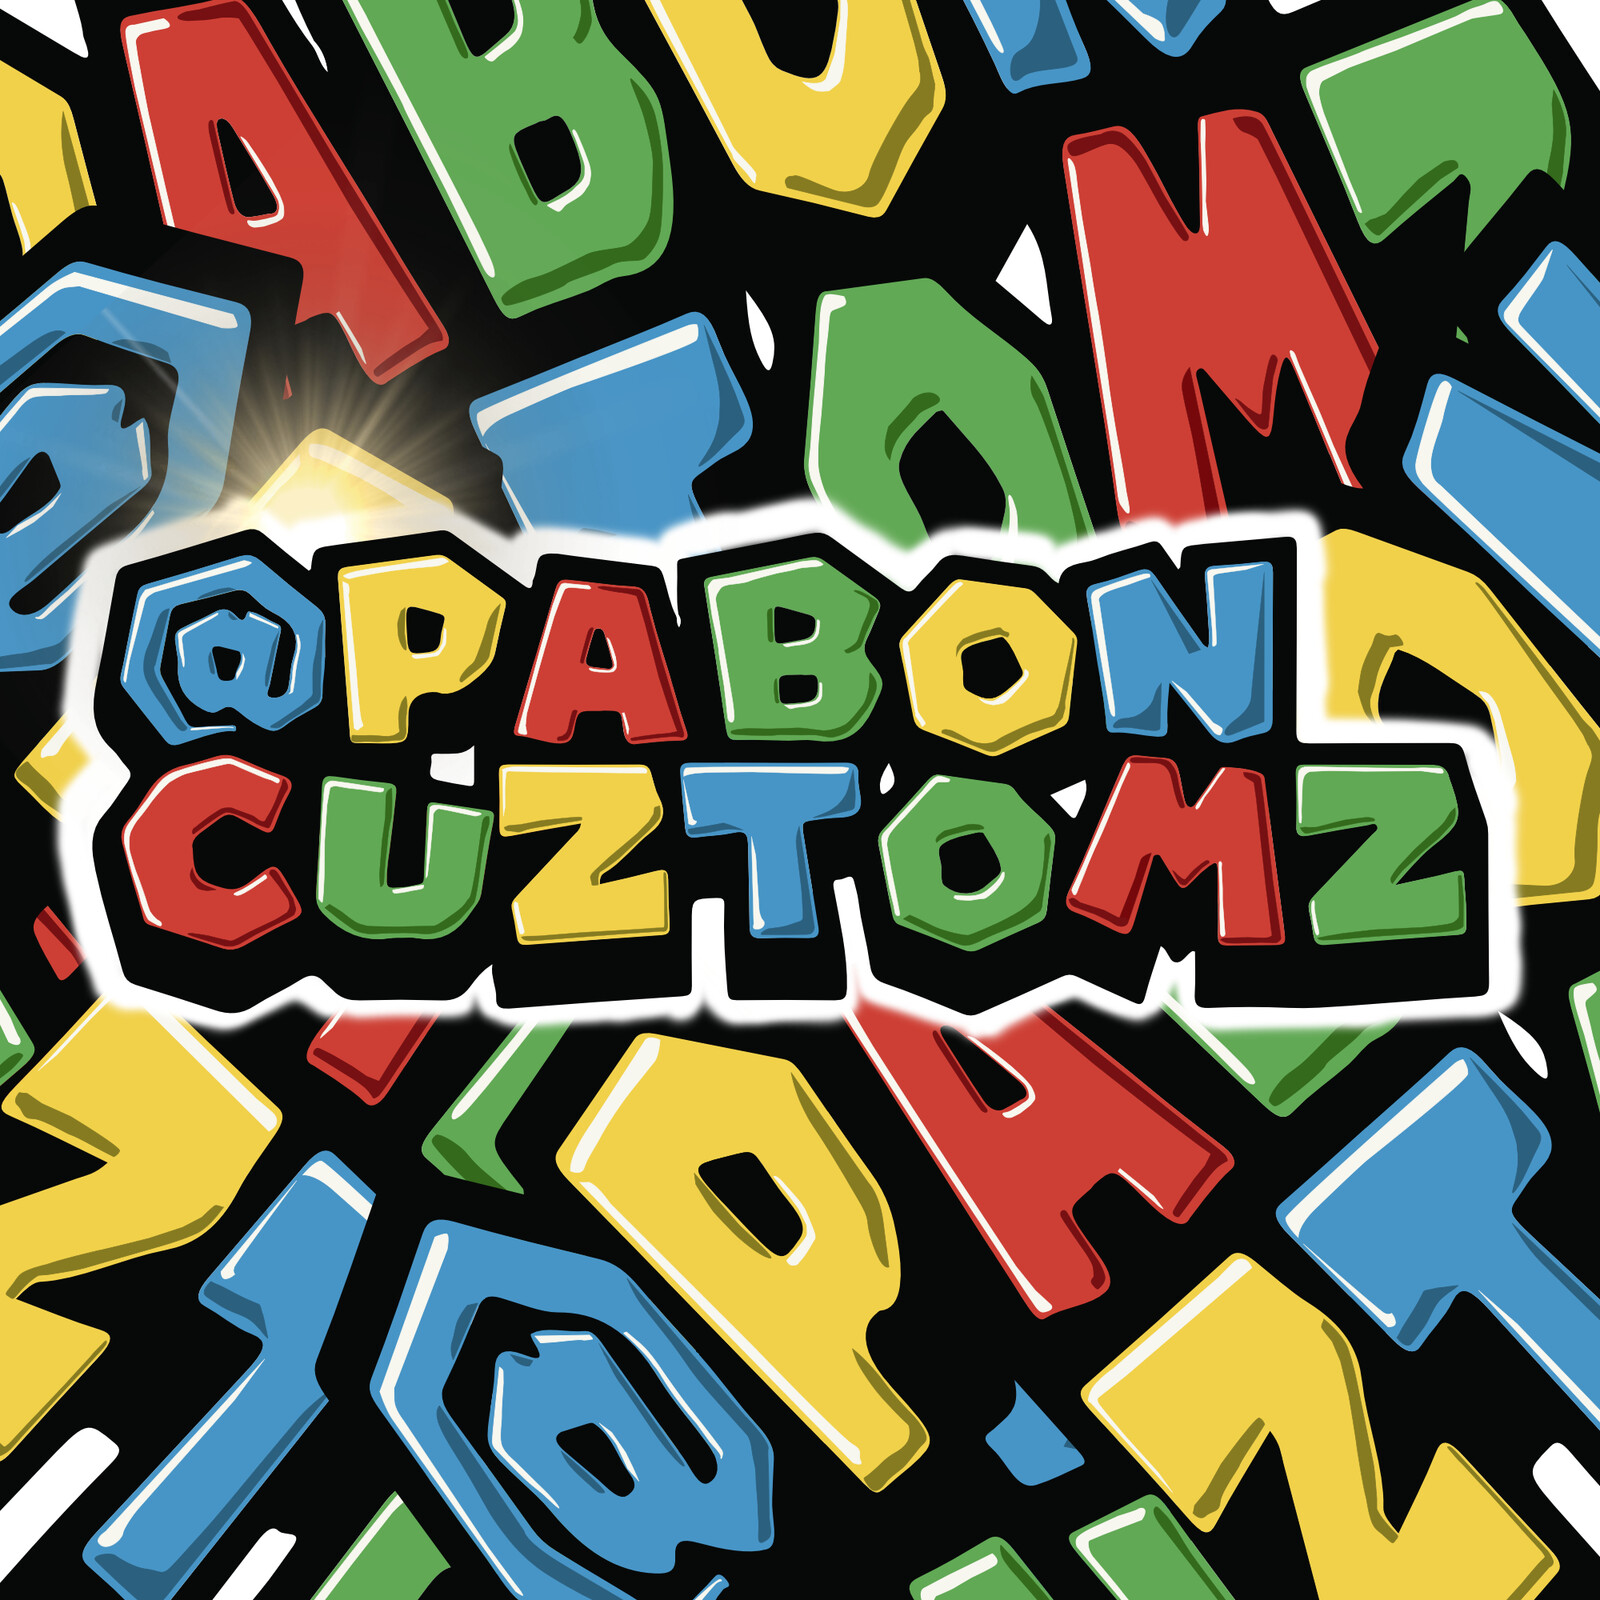 @Pabon Cuztomz Logo Design